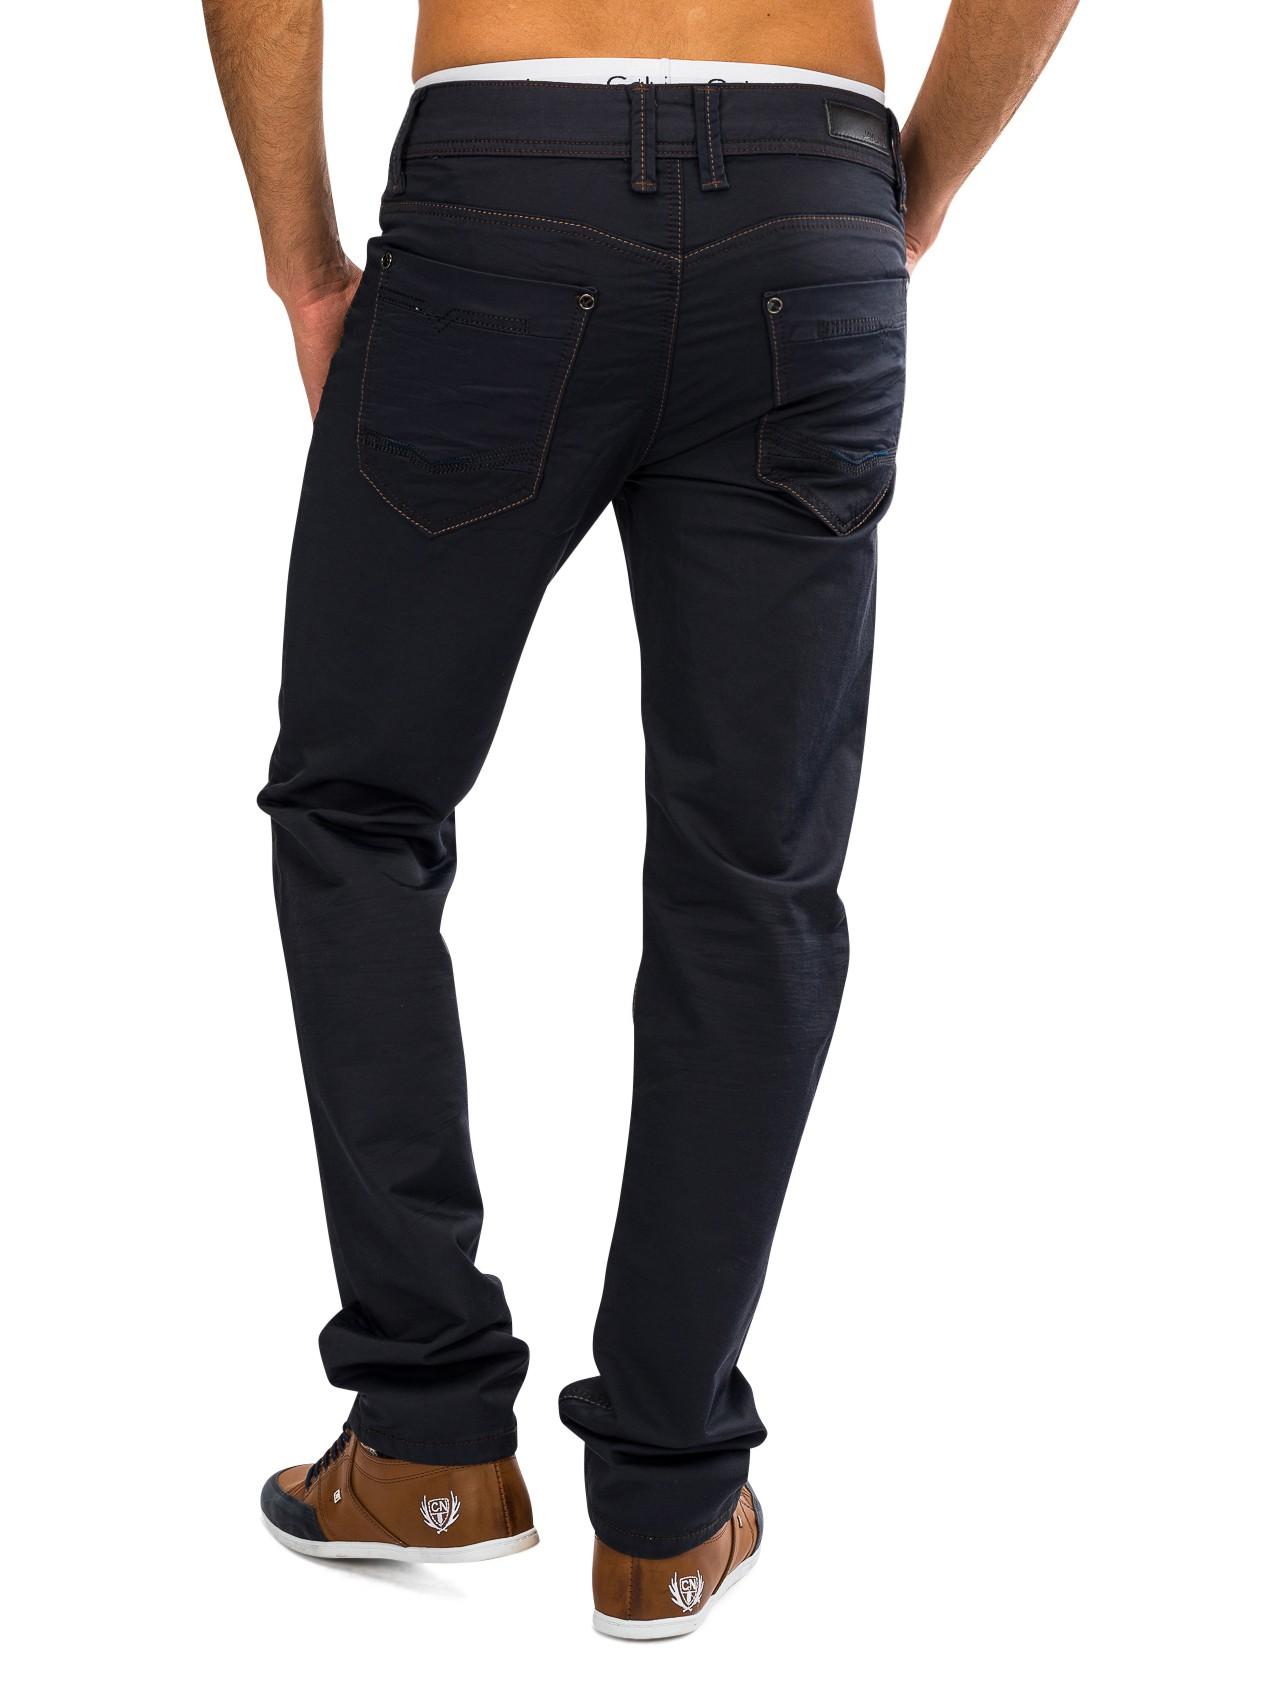 herren coated denim blau jeans stoffhose hose gl nzend chino straight ebay. Black Bedroom Furniture Sets. Home Design Ideas